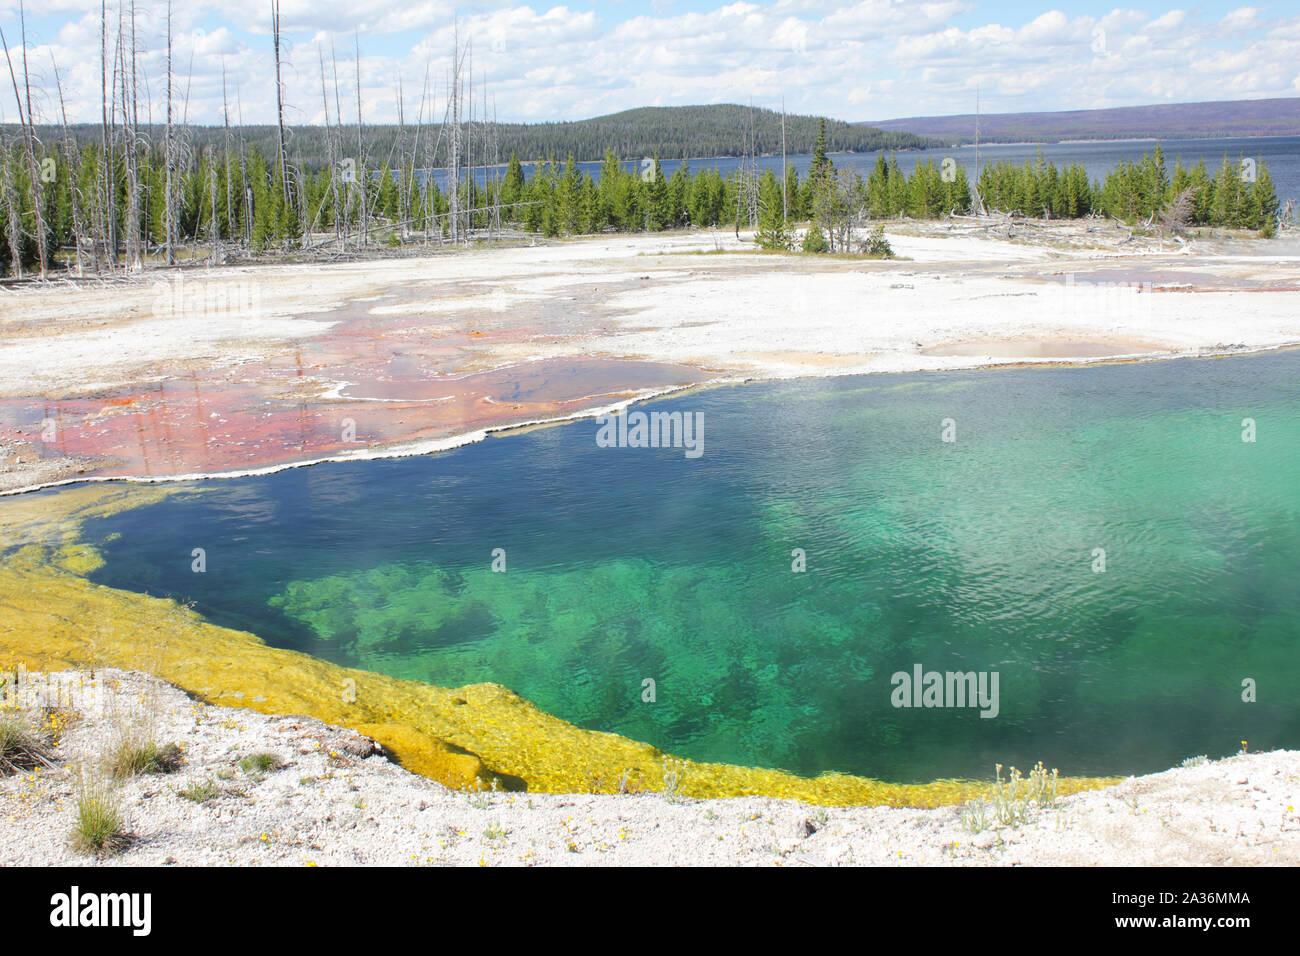 Detalle de hot spring mat bacteriana y agua hirviendo, azul profundo lago Yellowstone, el parque nacional de Yellowstone. Foto de stock